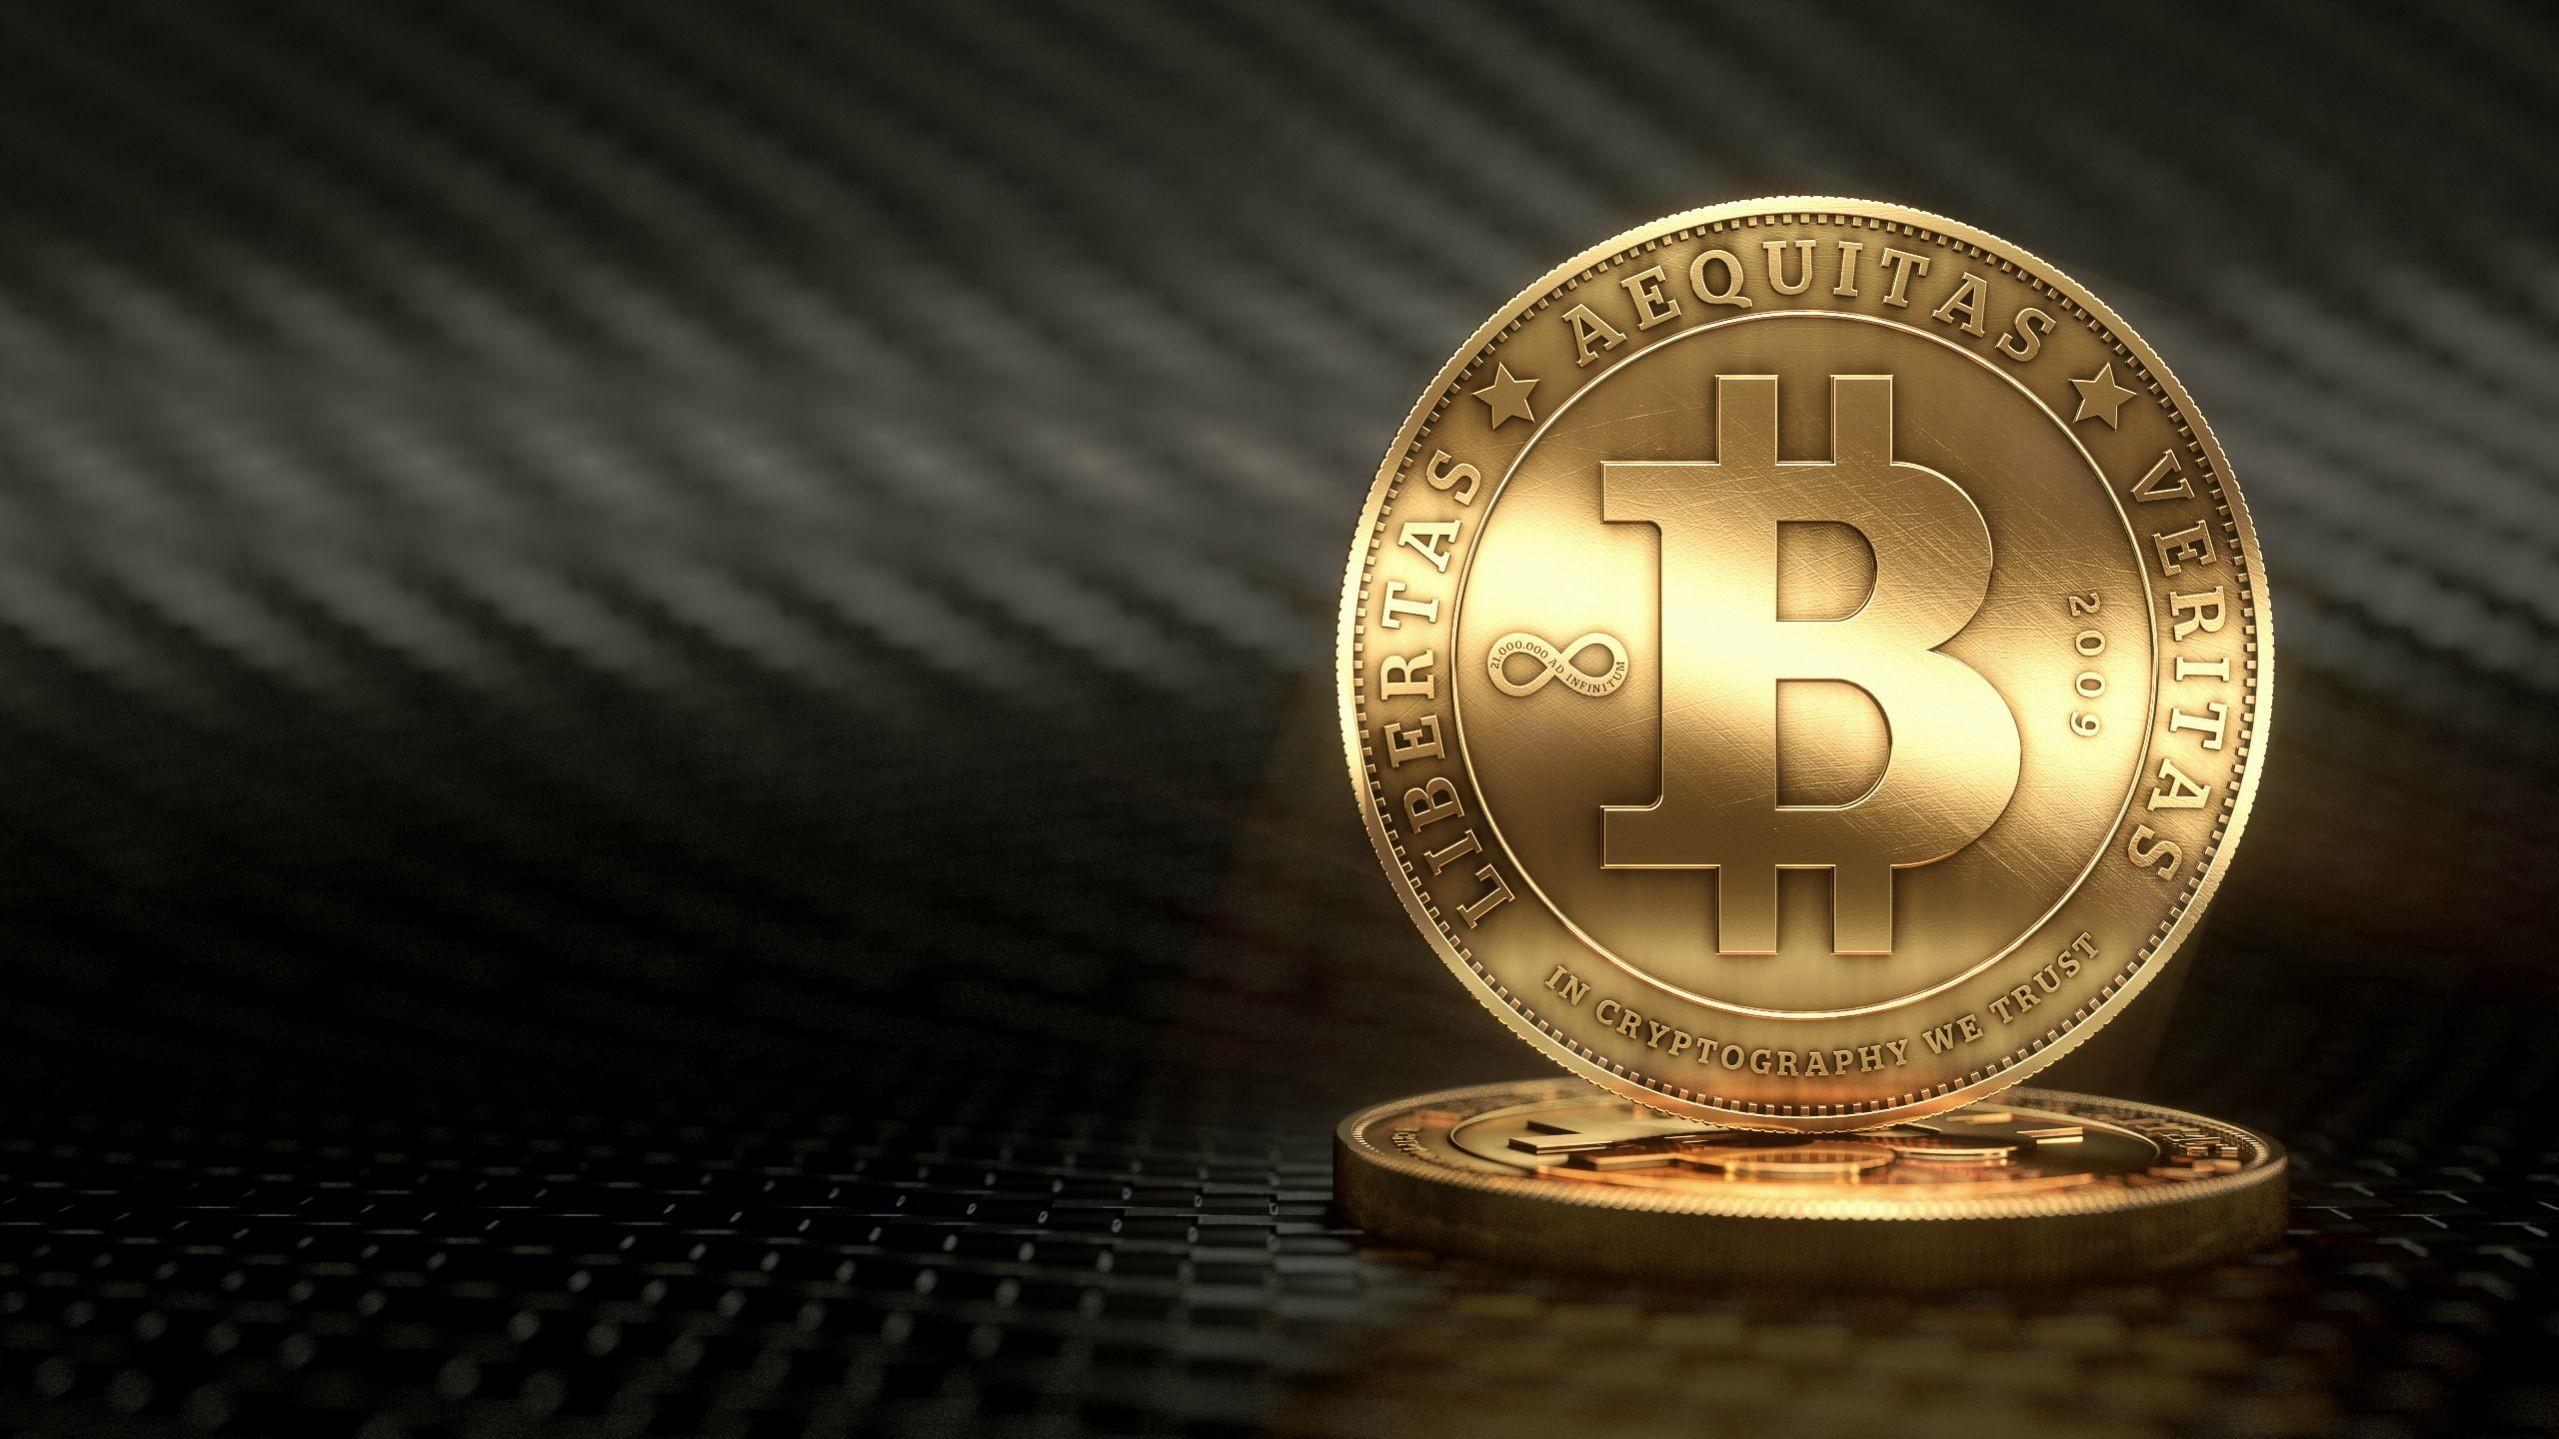 General 2559x1439 Bitcoin coins gold